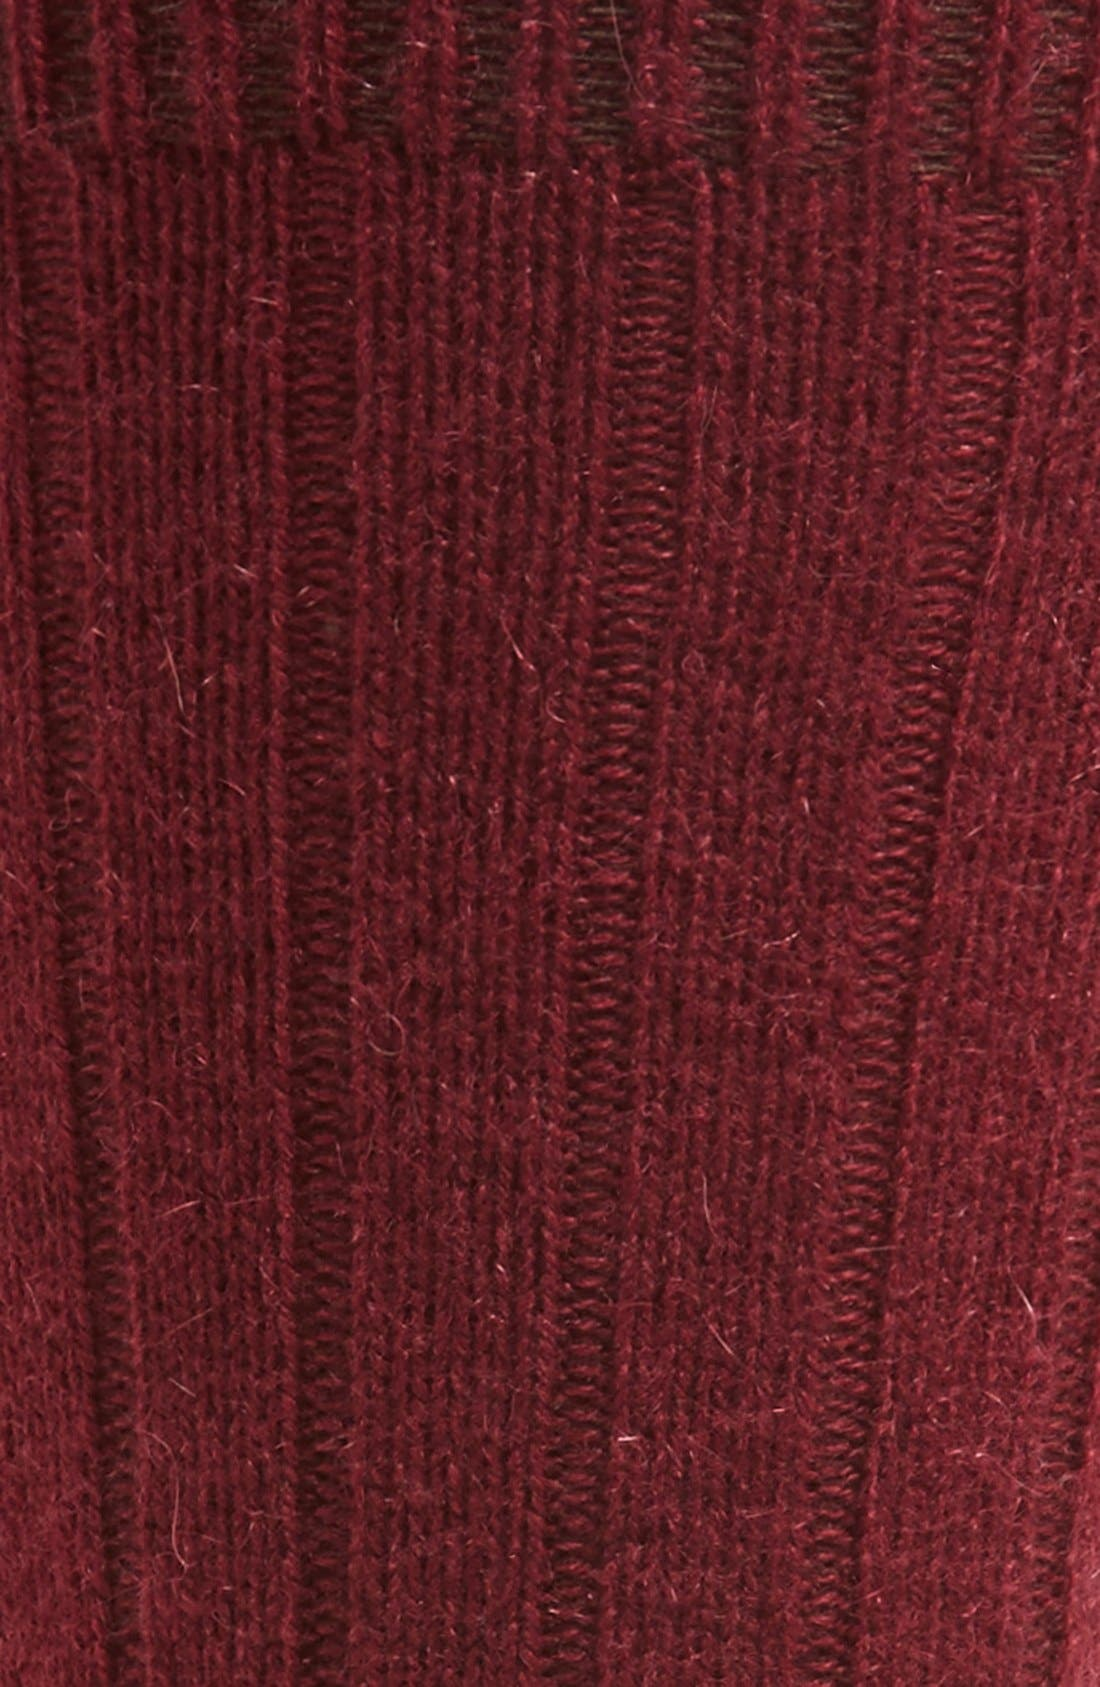 'Waddington' Cashmere Blend Mid Calf Socks,                             Alternate thumbnail 2, color,                             Port